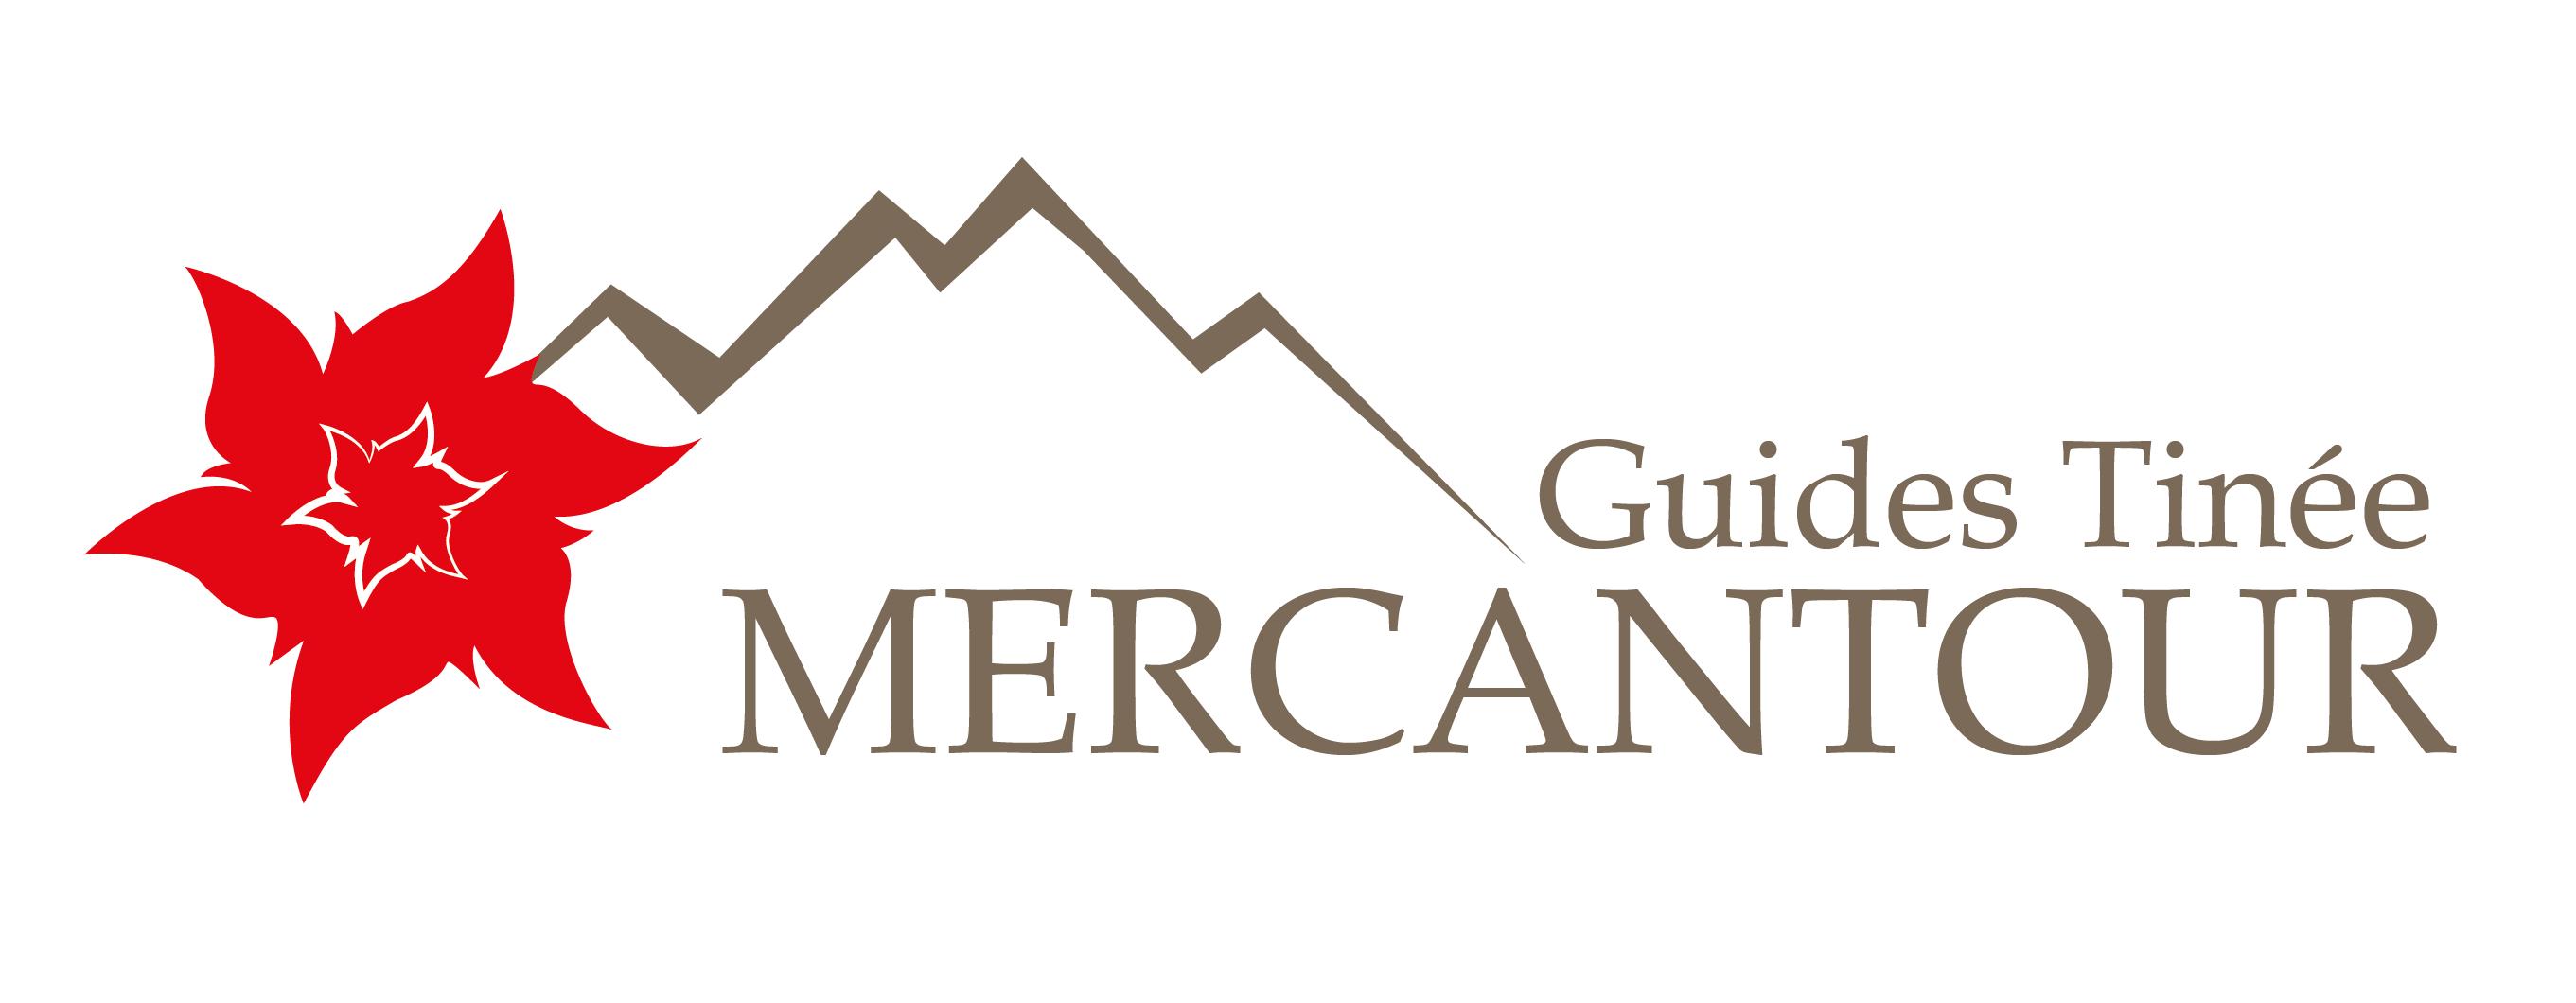 Guides Tinée Mercantour